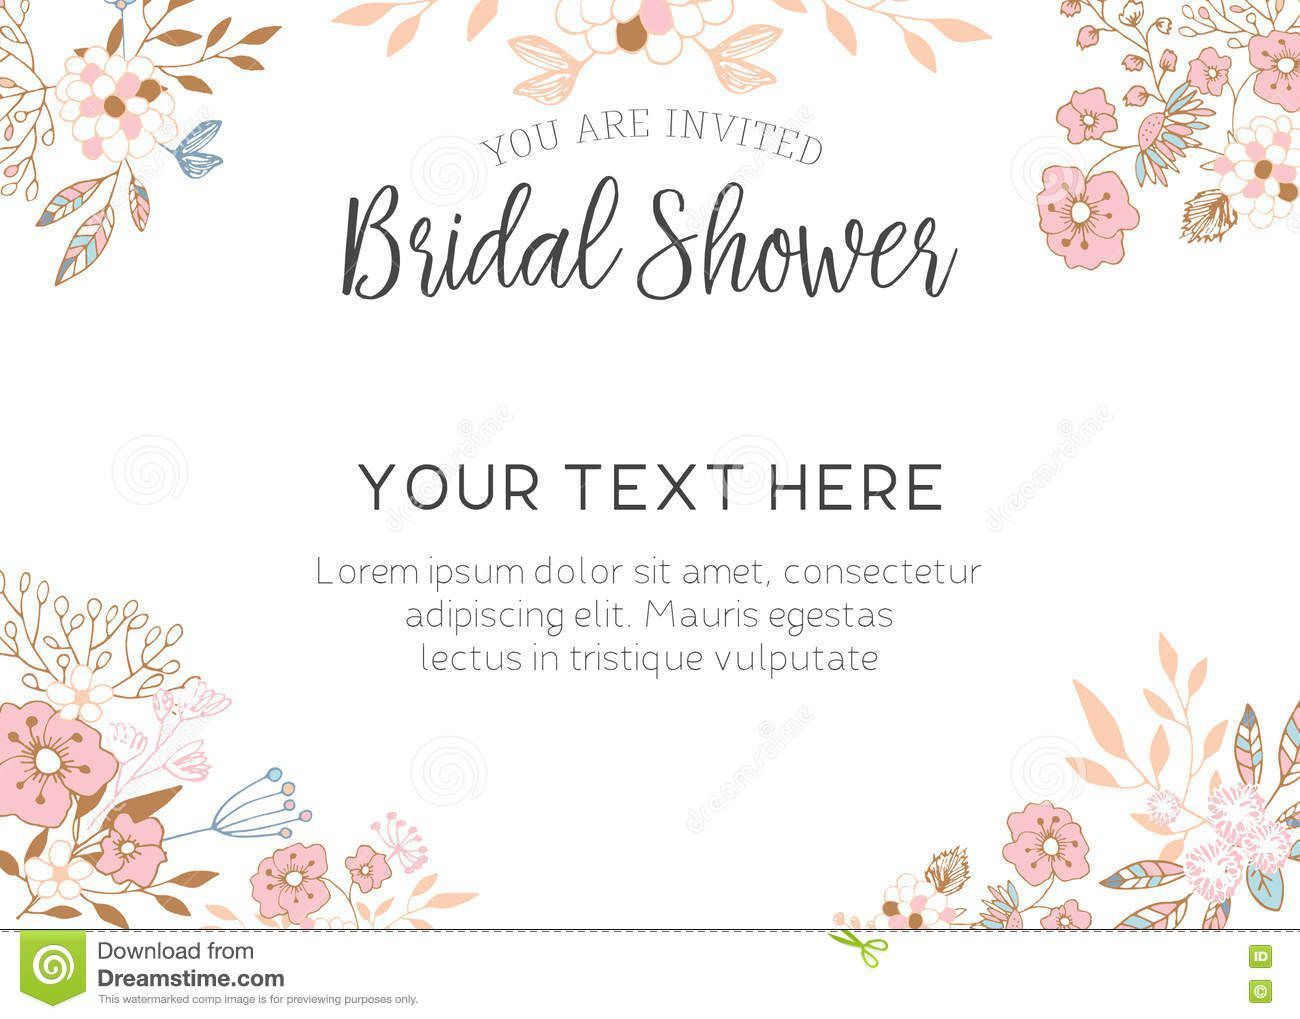 001 Simple Free Bridal Shower Invite Template Design  Invitation For Word Wedding MicrosoftFull